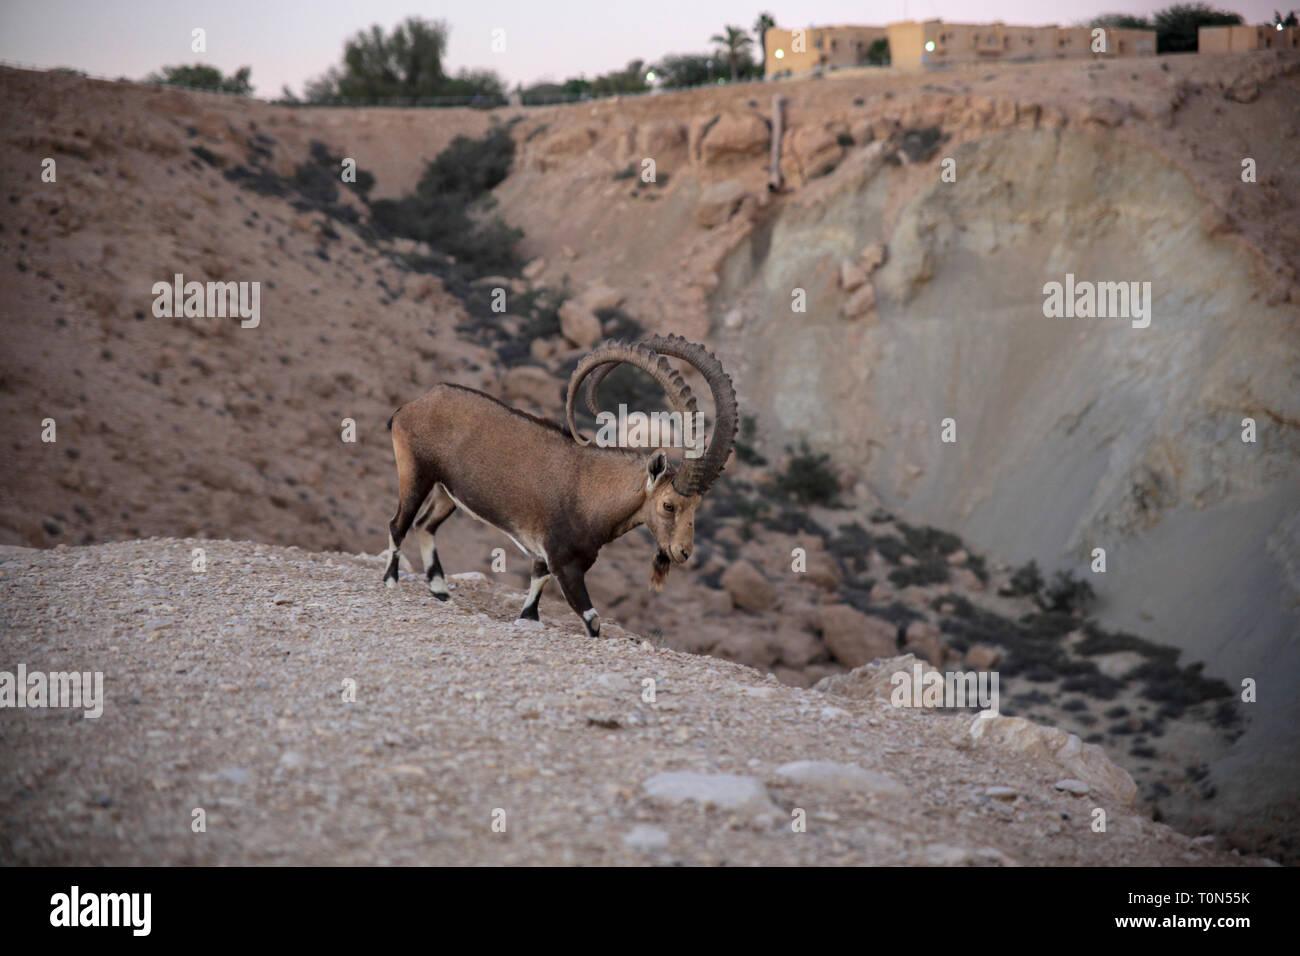 Impressive Male Nubian Ibex (Capra ibex nubiana AKA Capra nubiana). Photographed at Kibbutz Sde Boker, Negev Desert, Israel in September Stock Photo